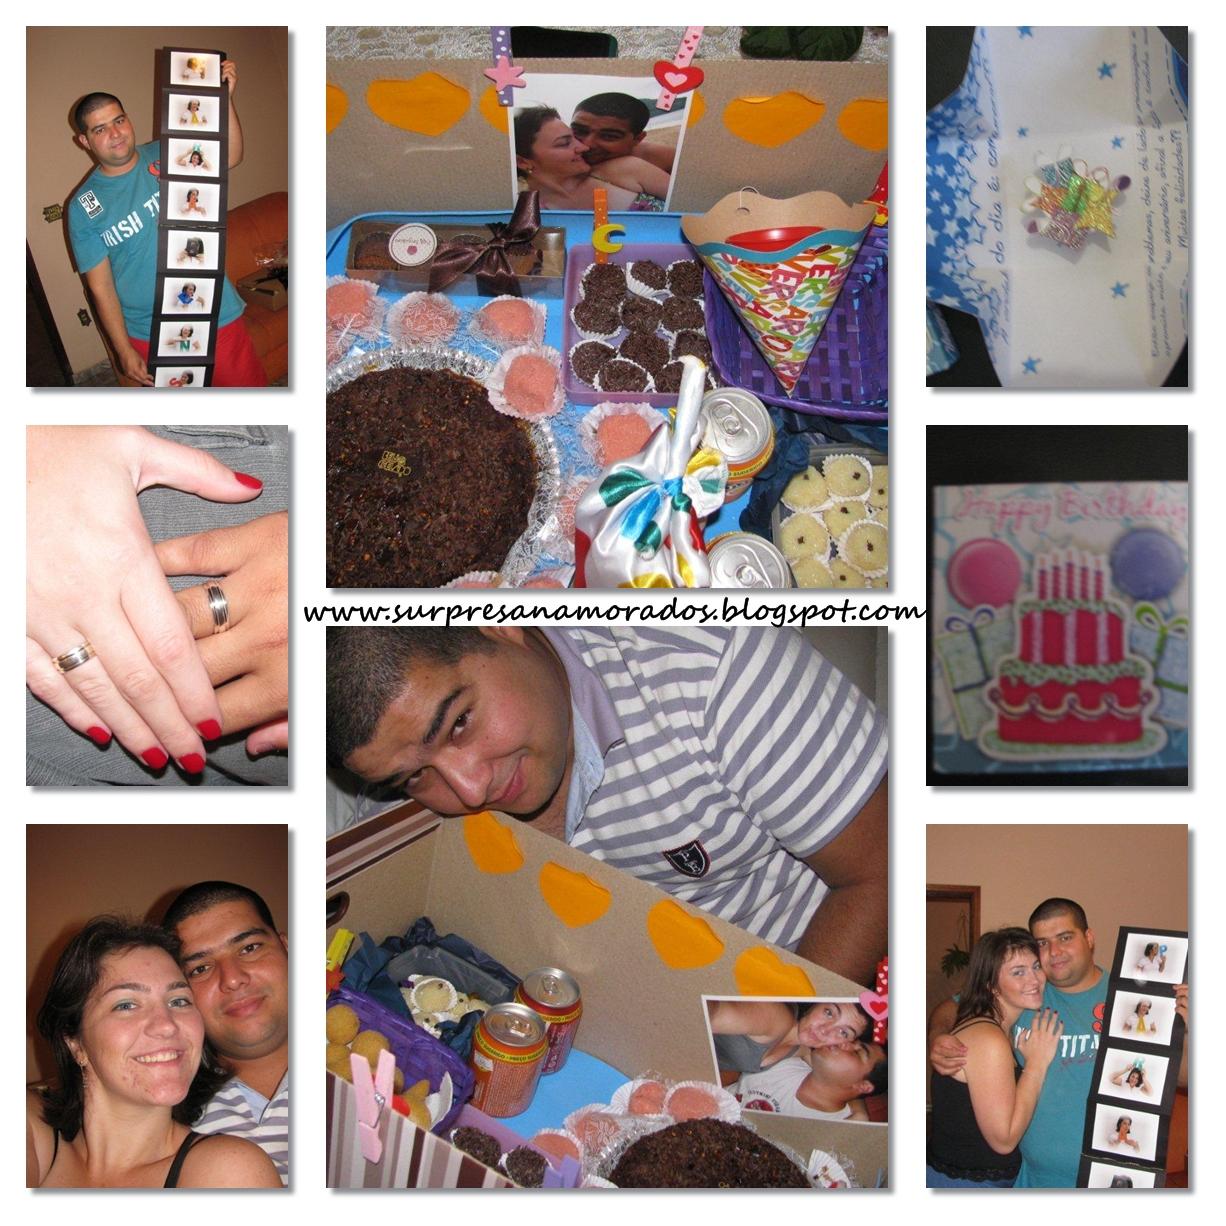 Aniversários de namoro Dicas para comemorar 1, 2, 3, 6